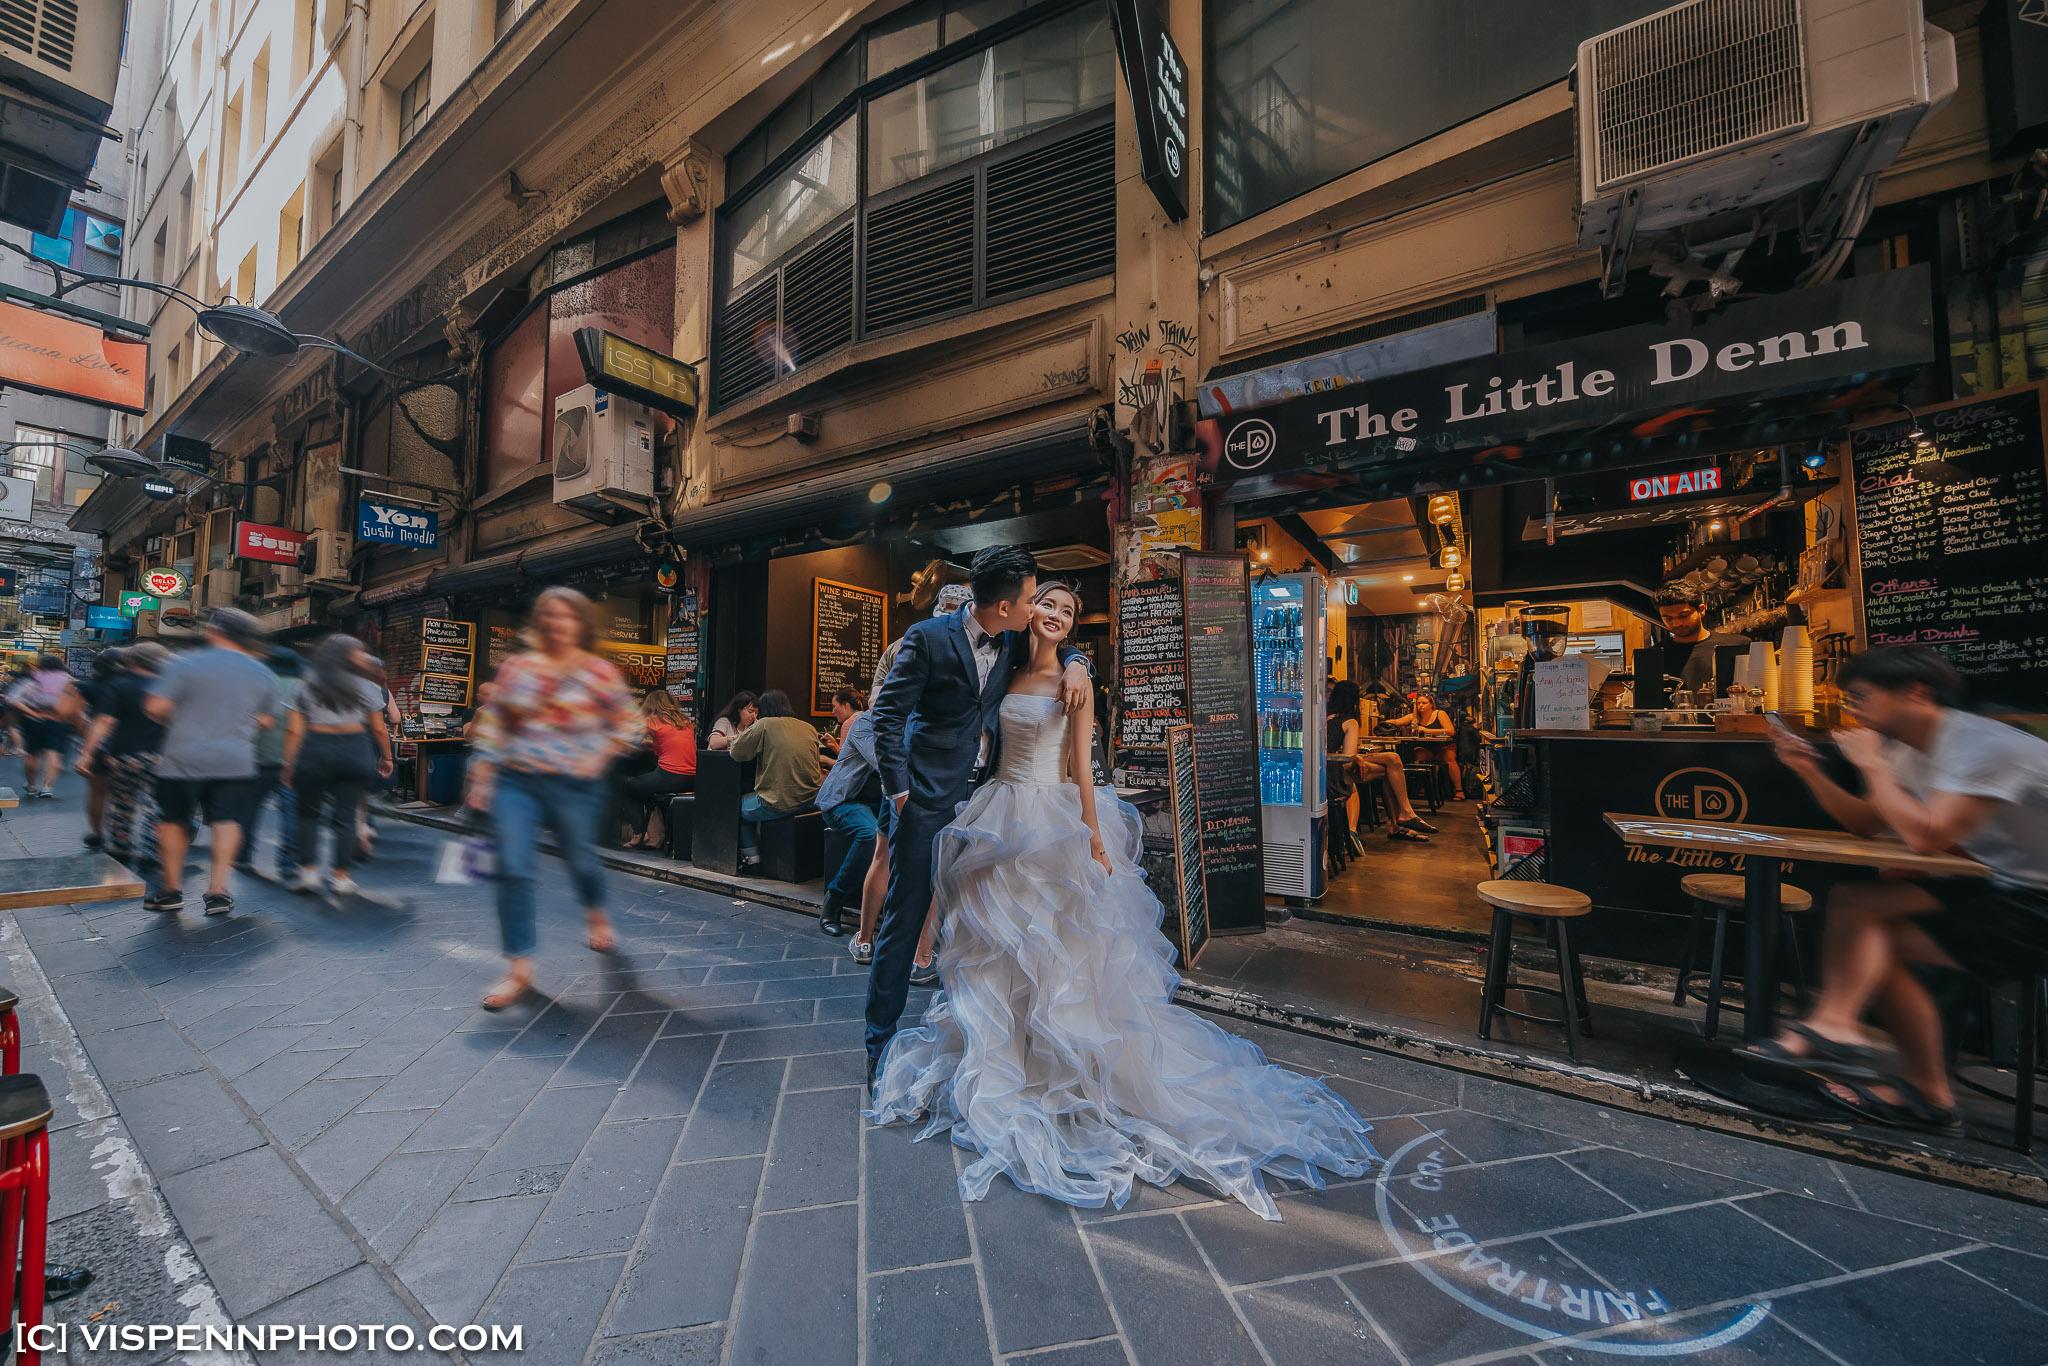 PRE WEDDING Photography Melbourne VISPENN 墨尔本 婚纱照 结婚照 婚纱摄影 AndyCHEN 5489 A7R2 VISPENN